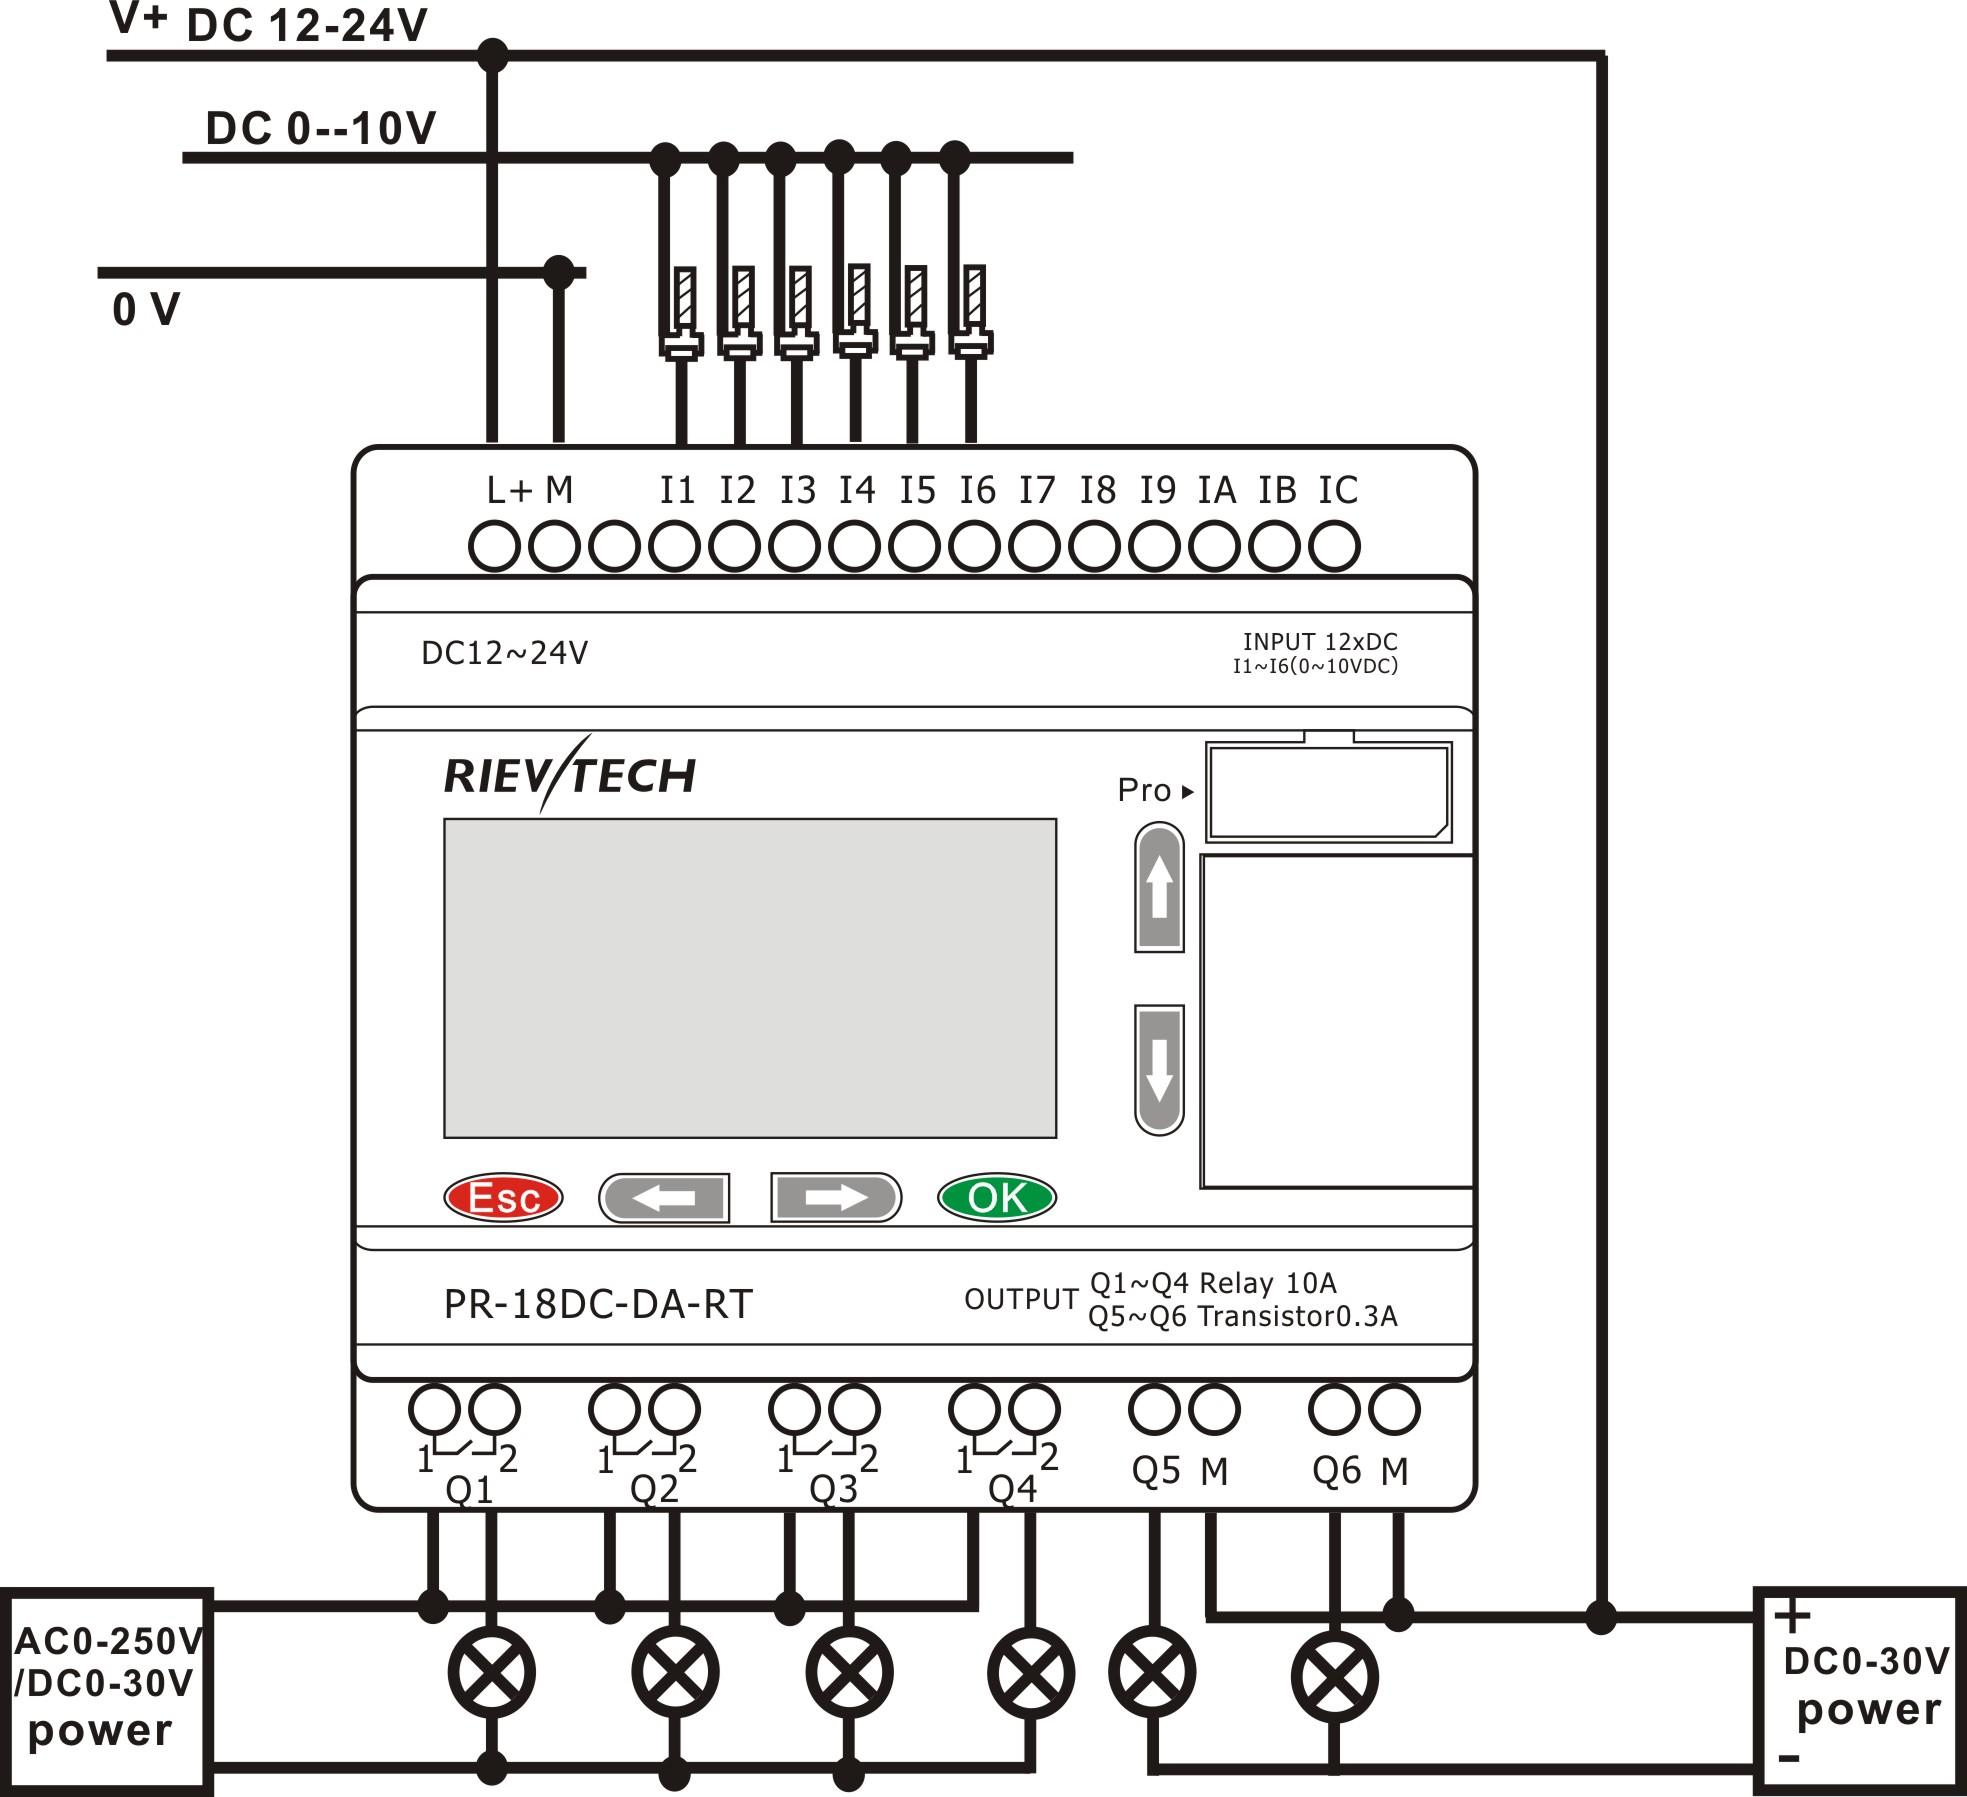 Siemens rtd wiring wire center pr 18dc da rt buy plc sms plc siemens logo product on rievtech rh rievtech com siemens motor rtd wiring rtd wiring color code cheapraybanclubmaster Images